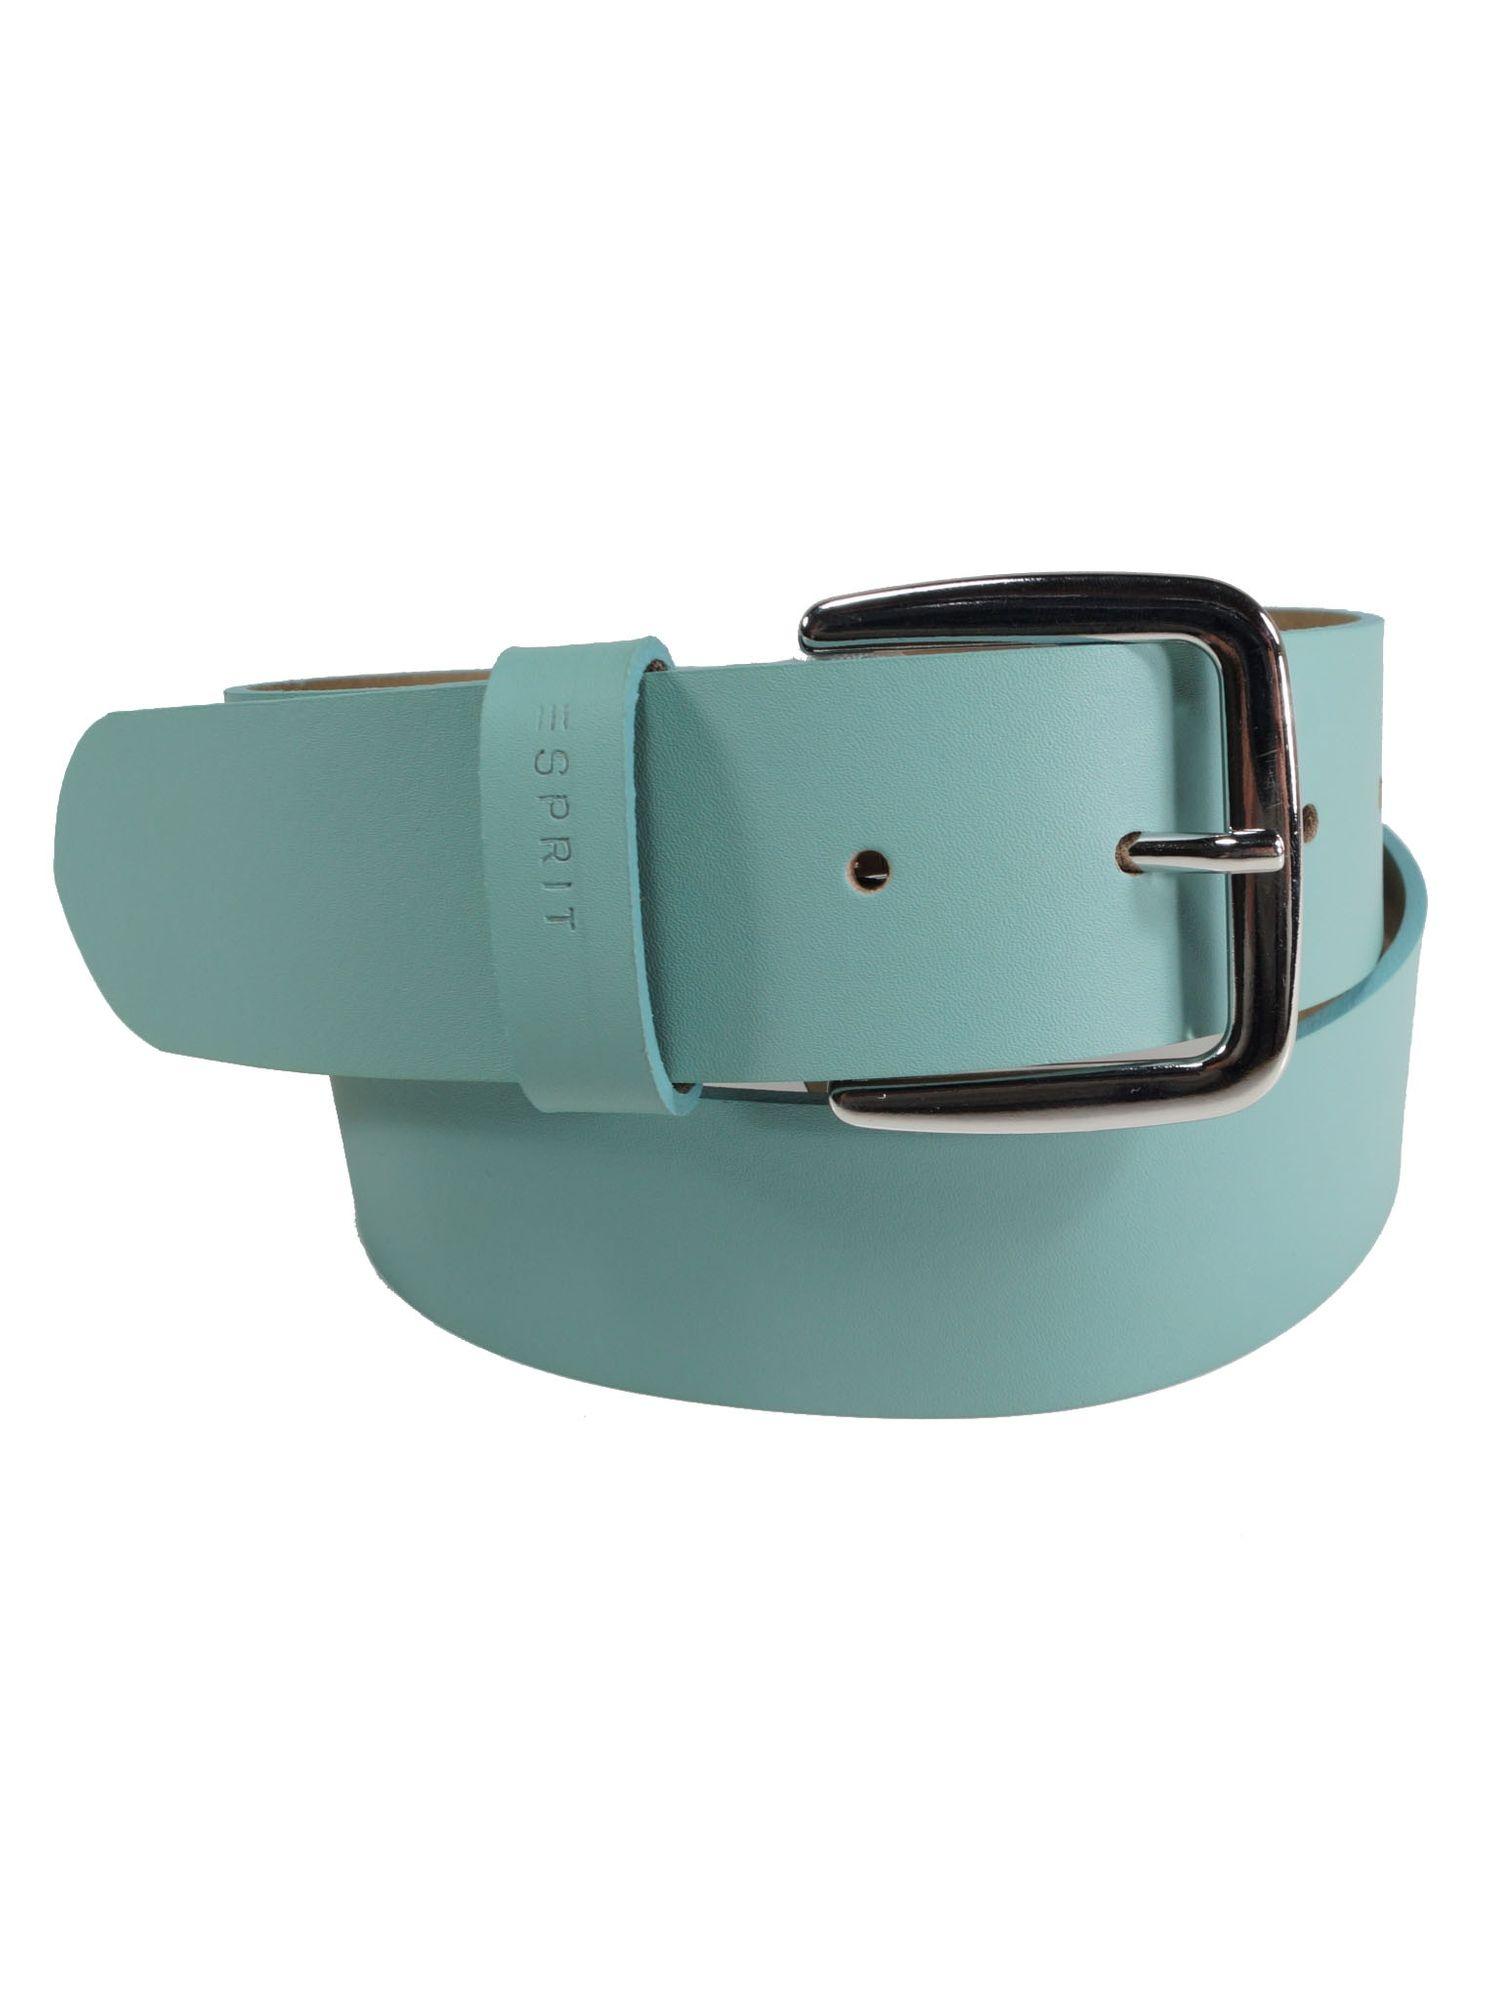 Esprit Damen Gürtel Jeansgürtel New basic belt Leder 80cm Türkis ... 6cb16f6a12